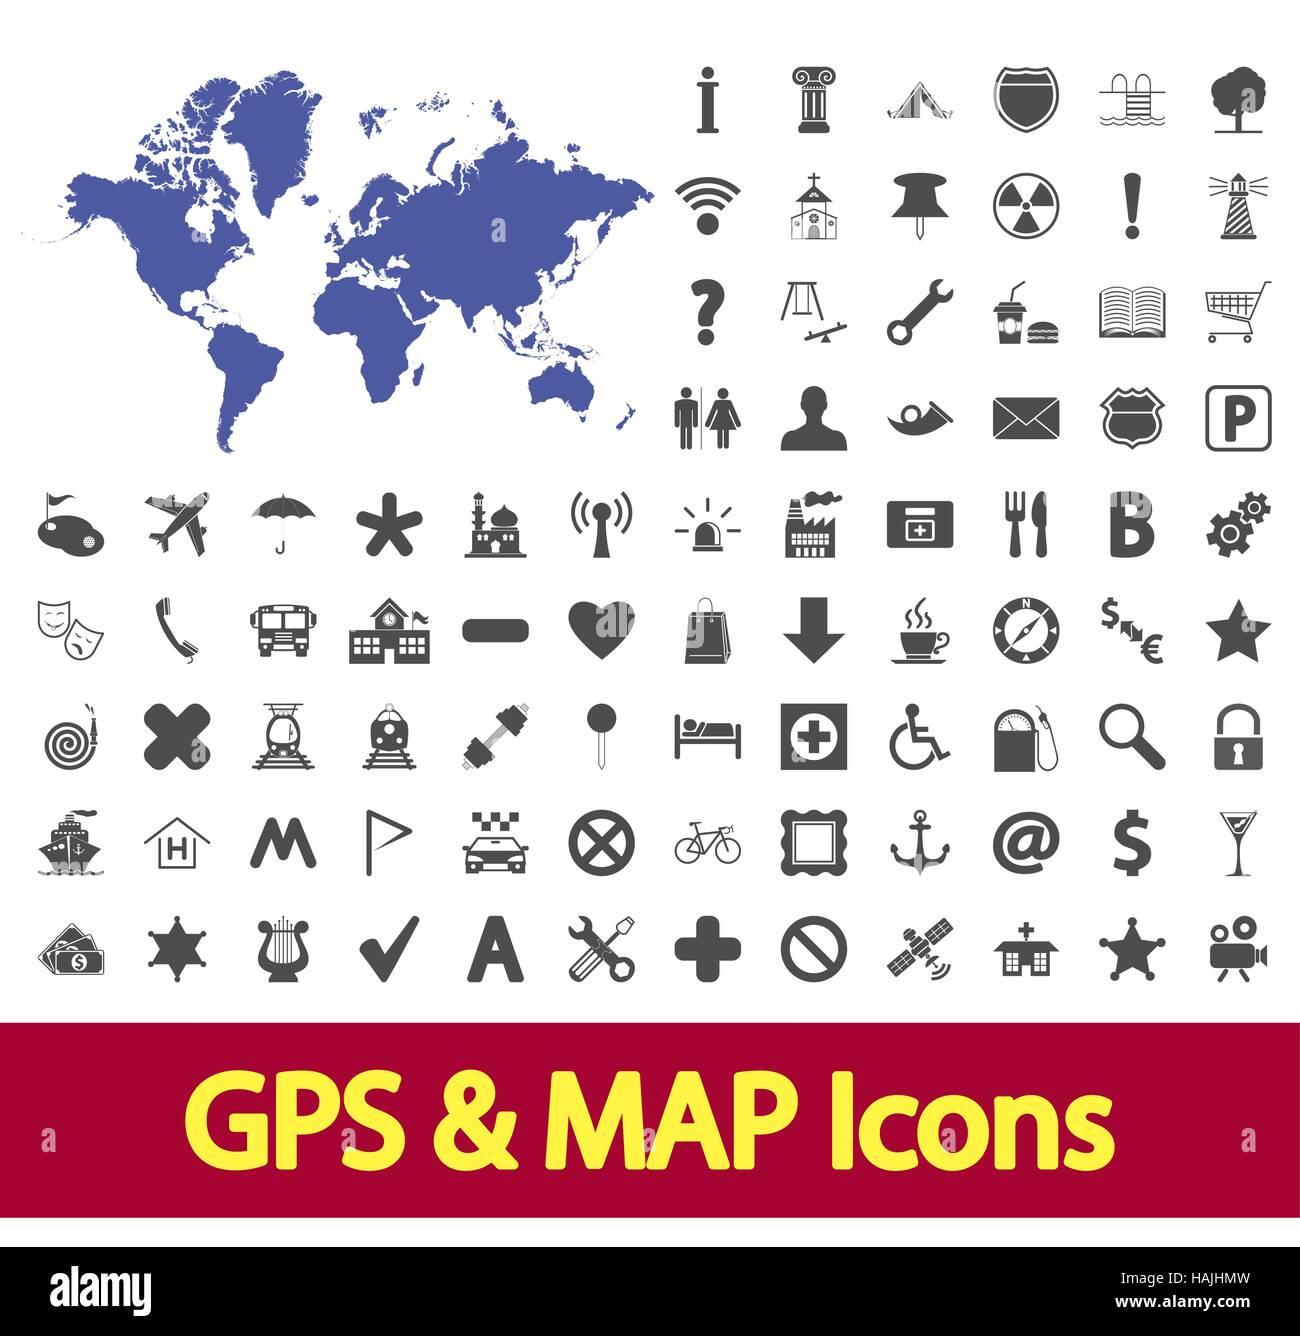 Navigation map icons set. Vector illustration. - Stock Image